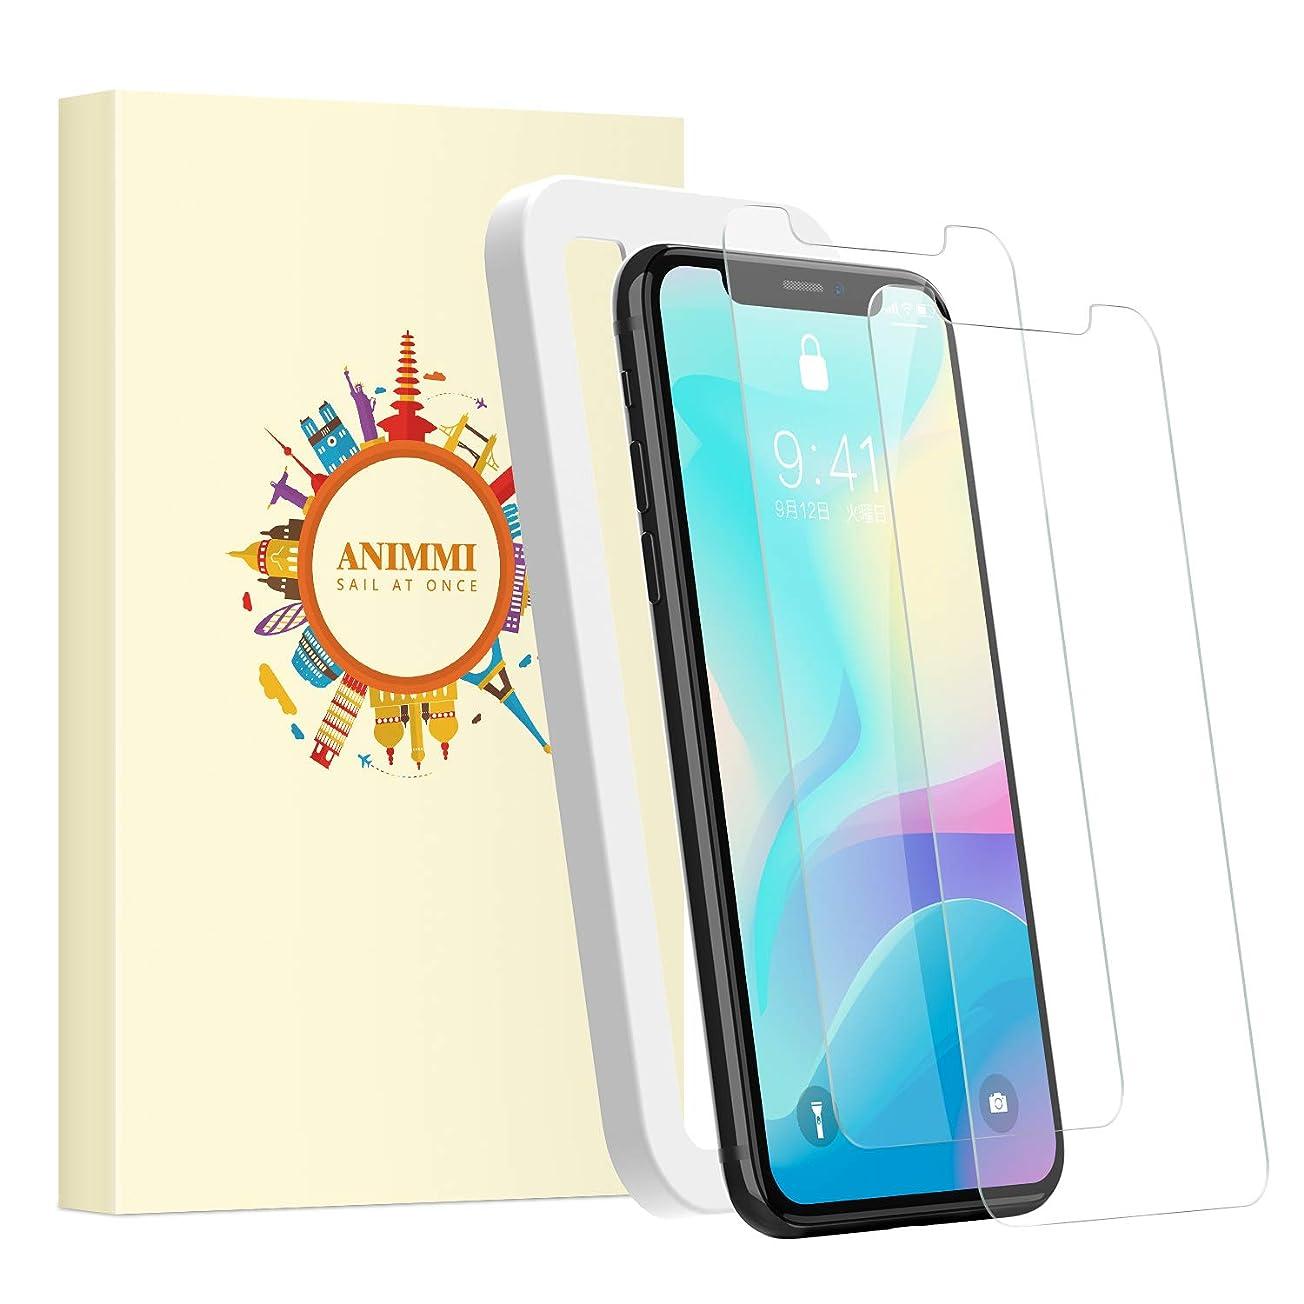 ANIMMI iPhoneXS/X用 強化ガラス液晶保護フィルム 【ガイド枠付き】最高硬度9H / 指紋防止 / 2枚組(アイフォン XS/X用 2019 11 Pro XI)